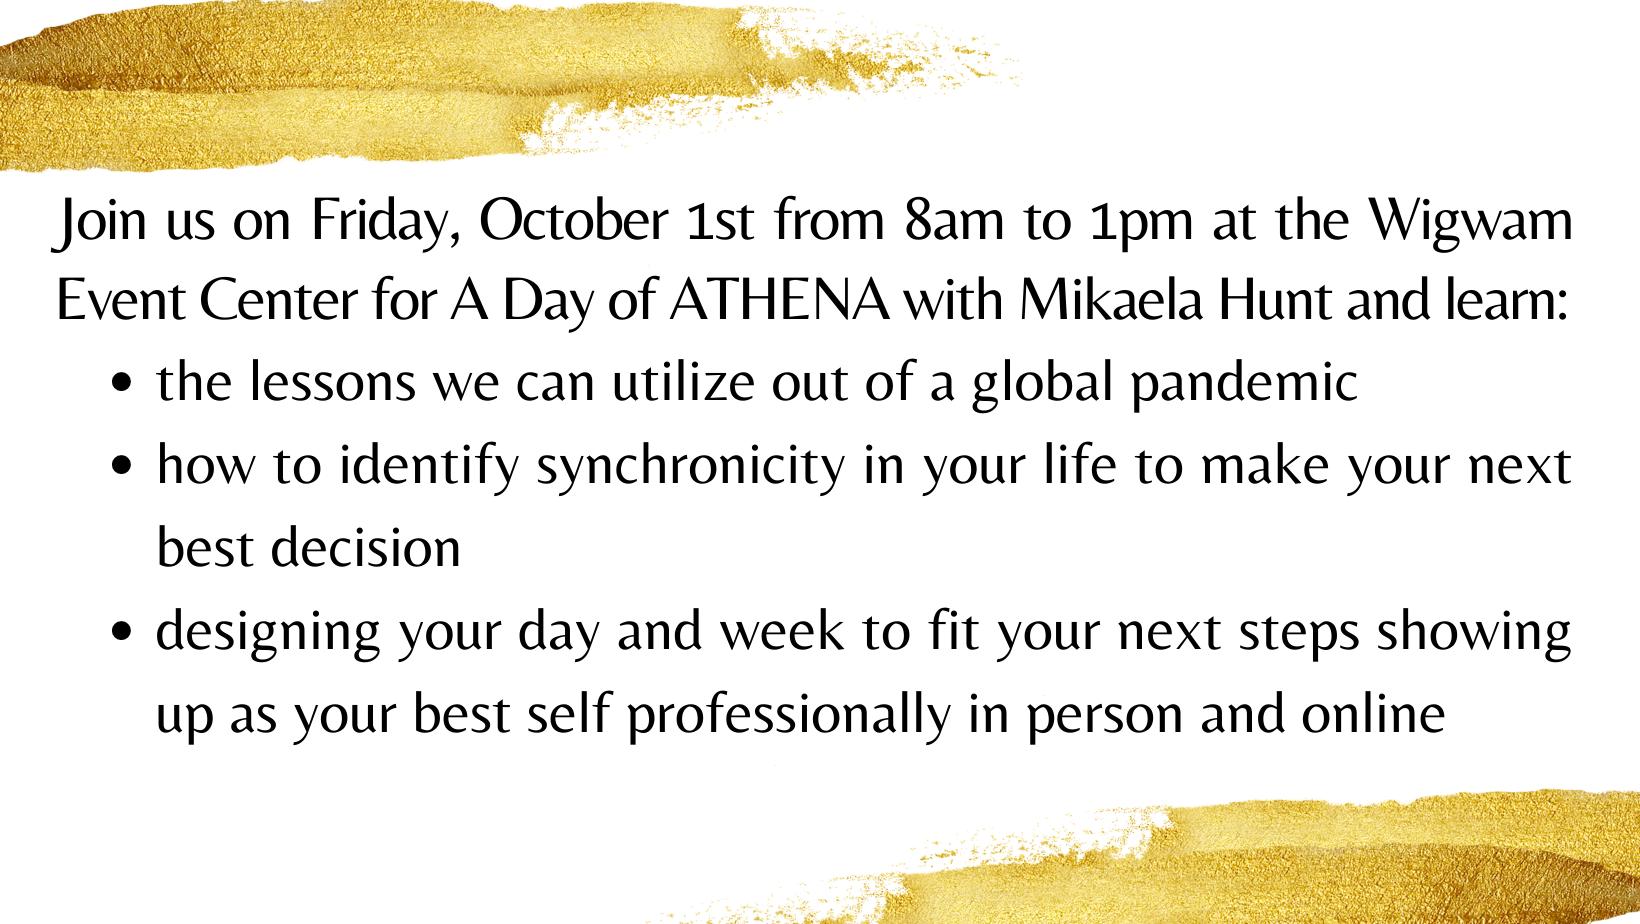 2021 A Day of ATHENA Workshop and Award Program